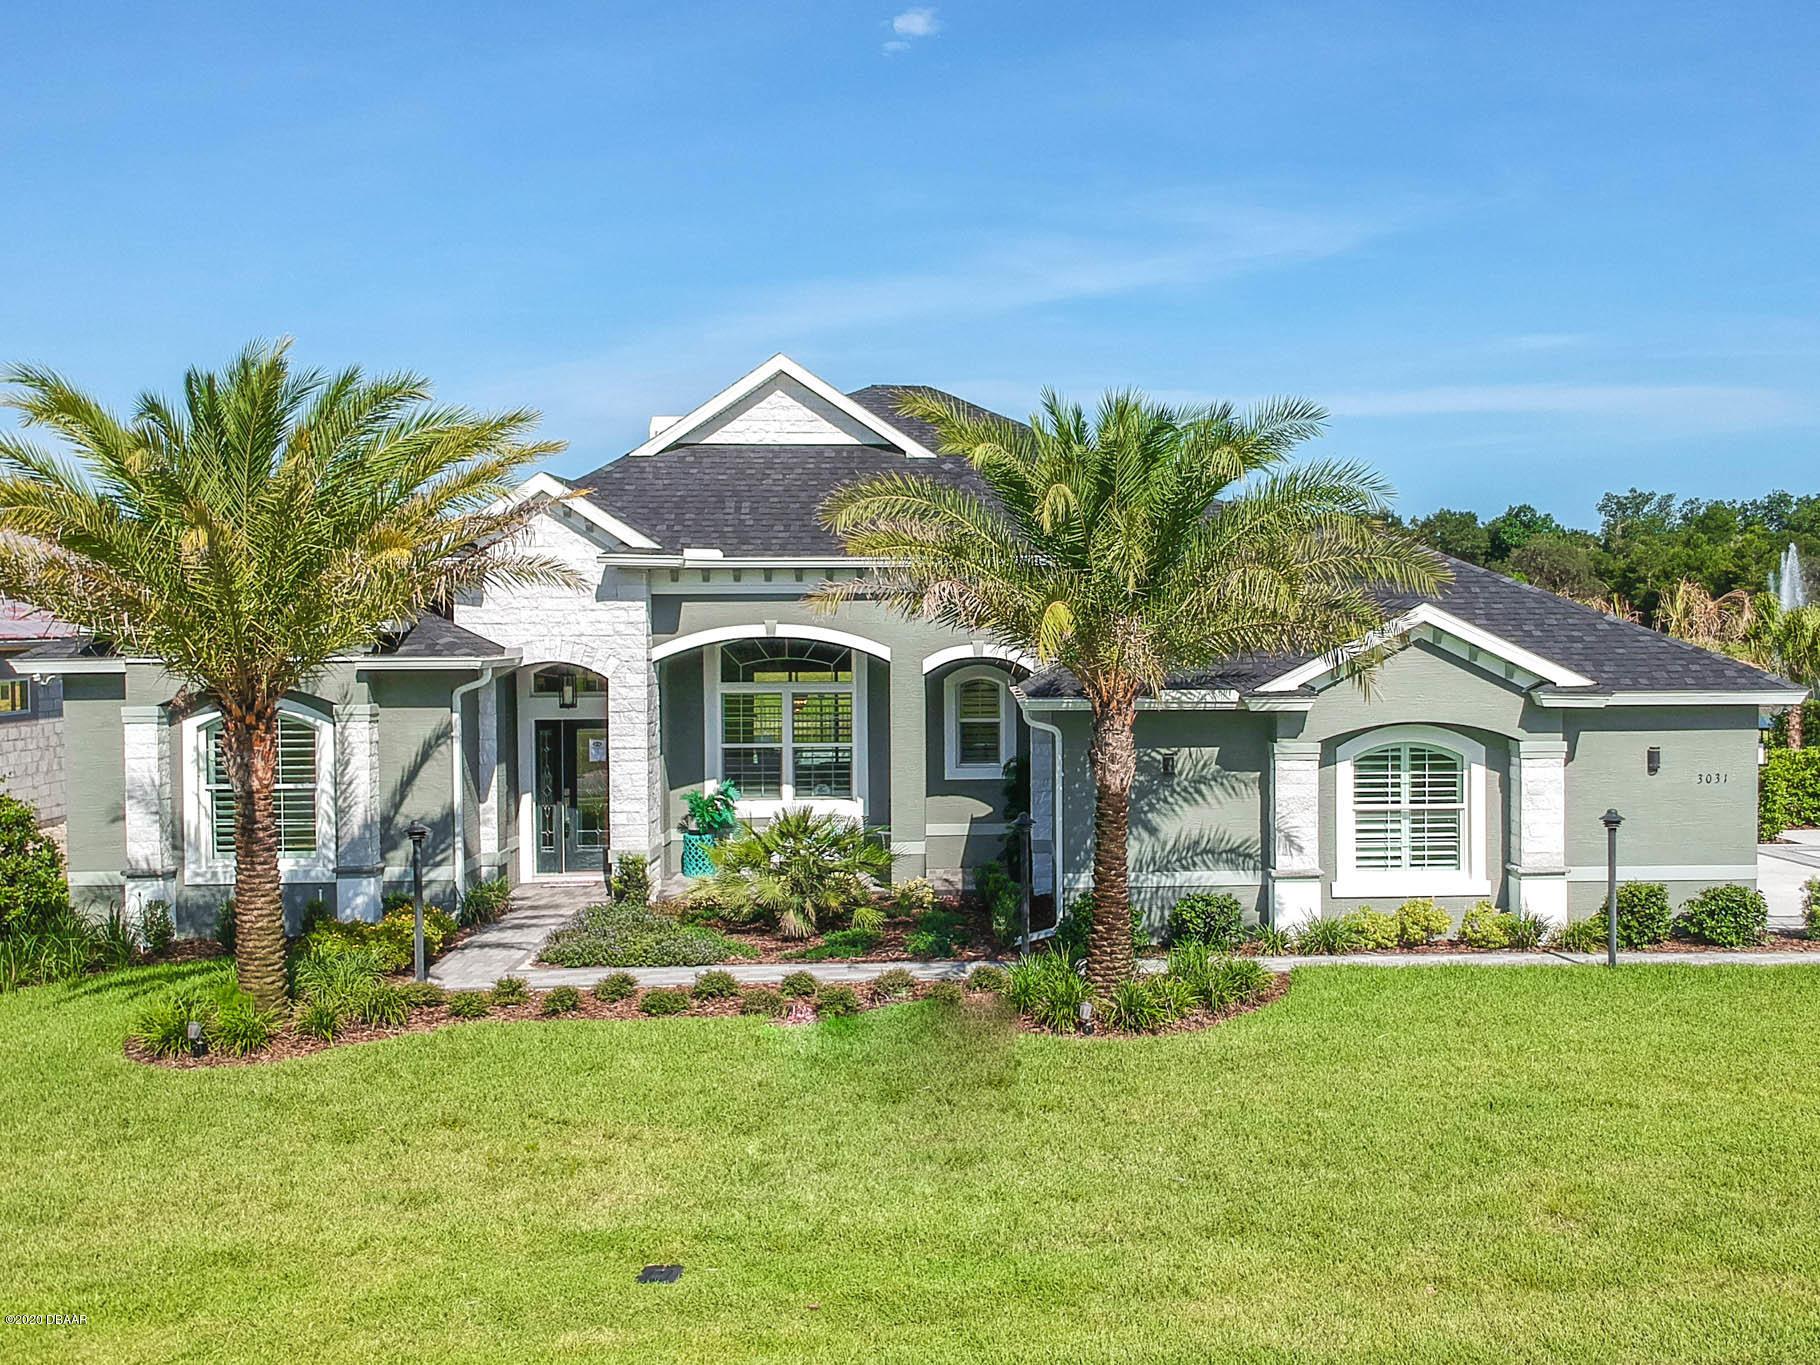 Photo of 3031 Silvermines Avenue, Ormond Beach, FL 32174